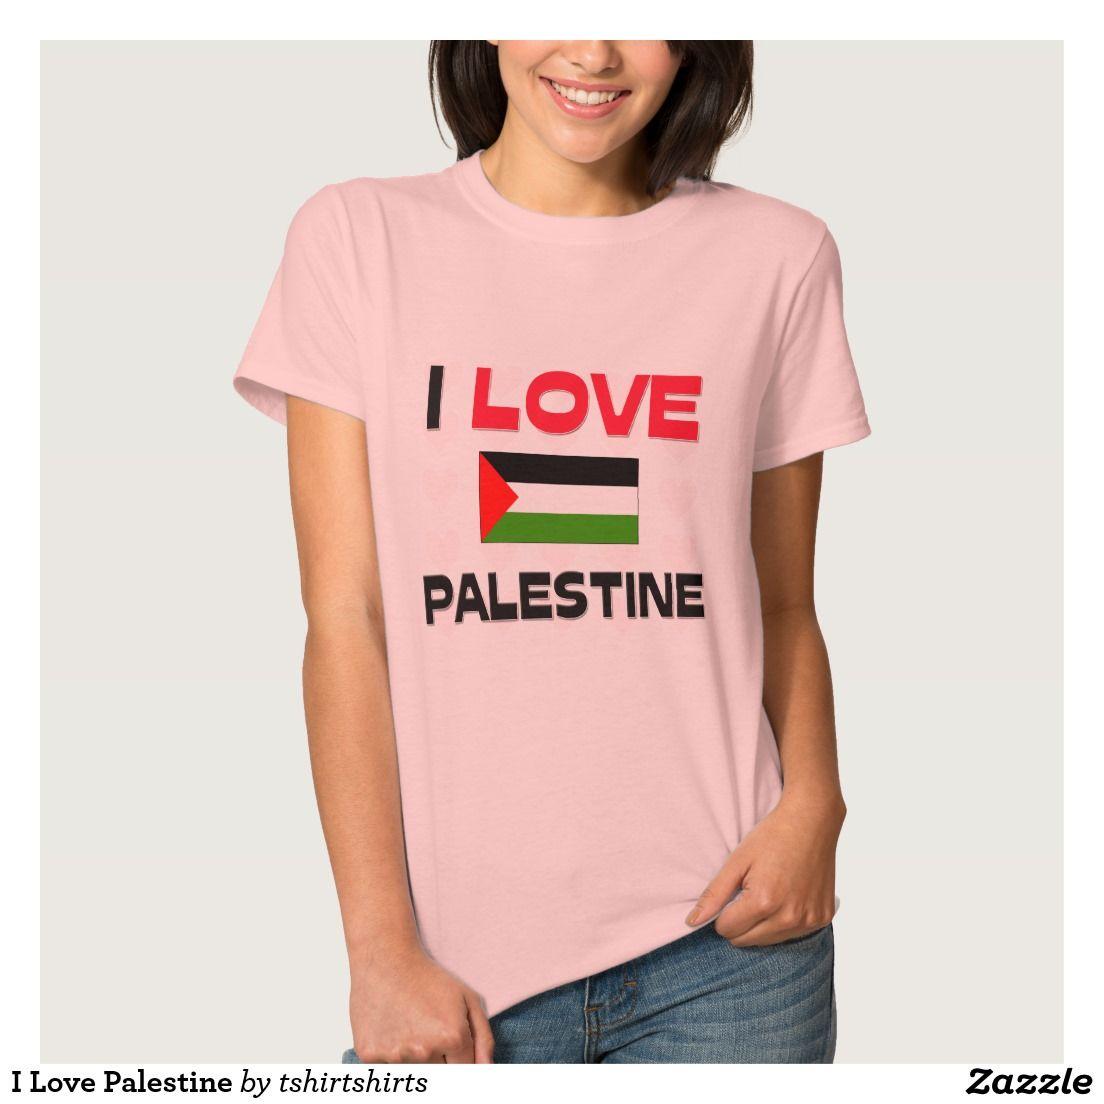 I Love Palestine T-shirts